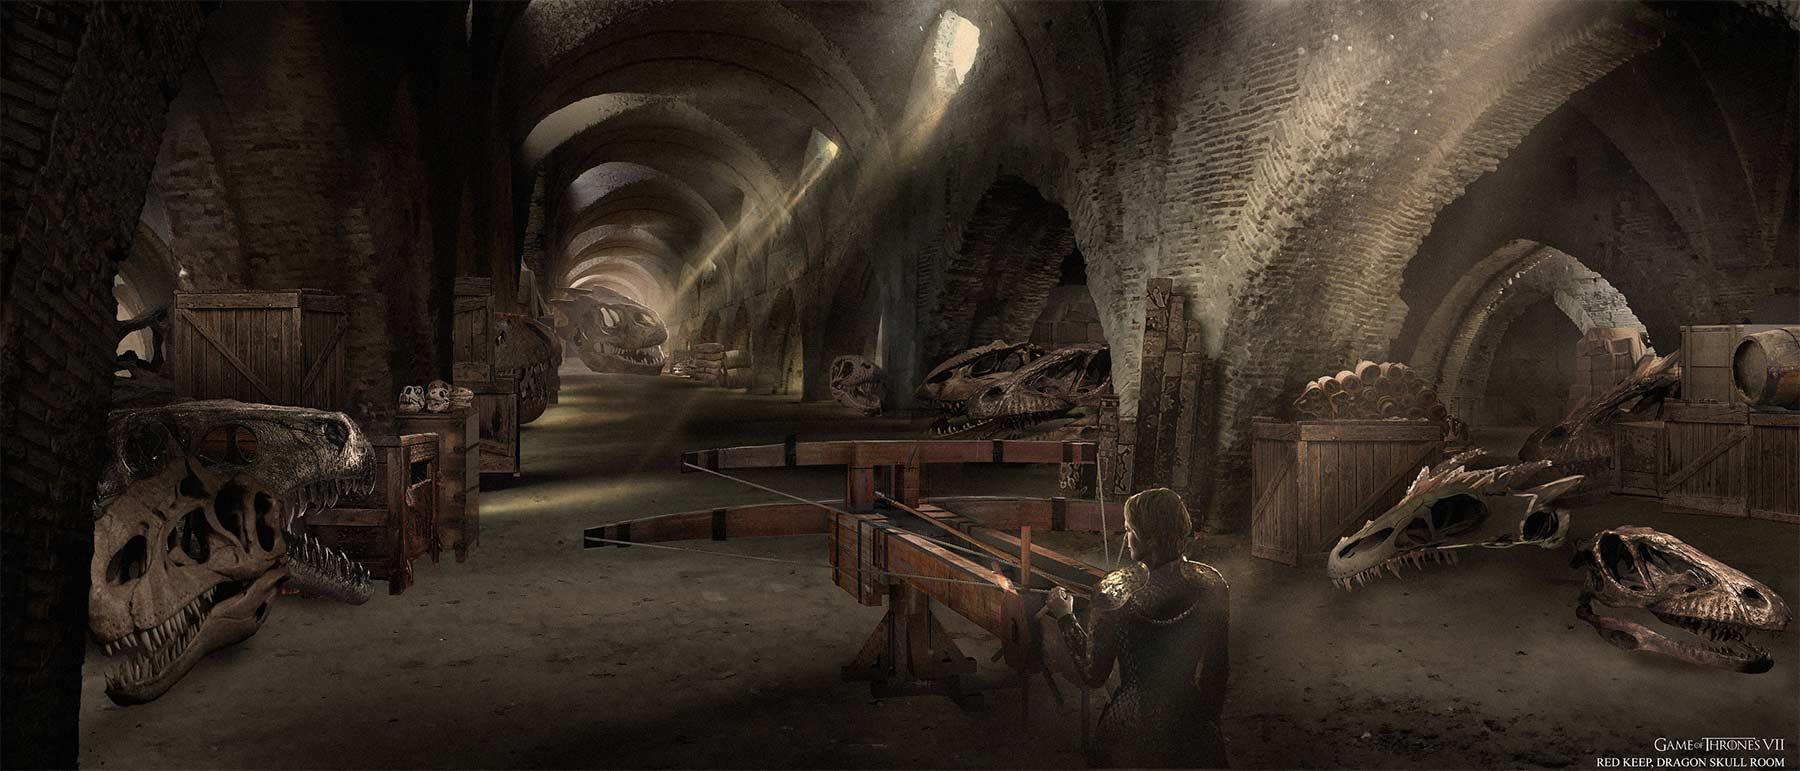 Game of Thrones Staffel 7 Concept Art Kieran-Belshaw-game-of-thrones-concept-art_14